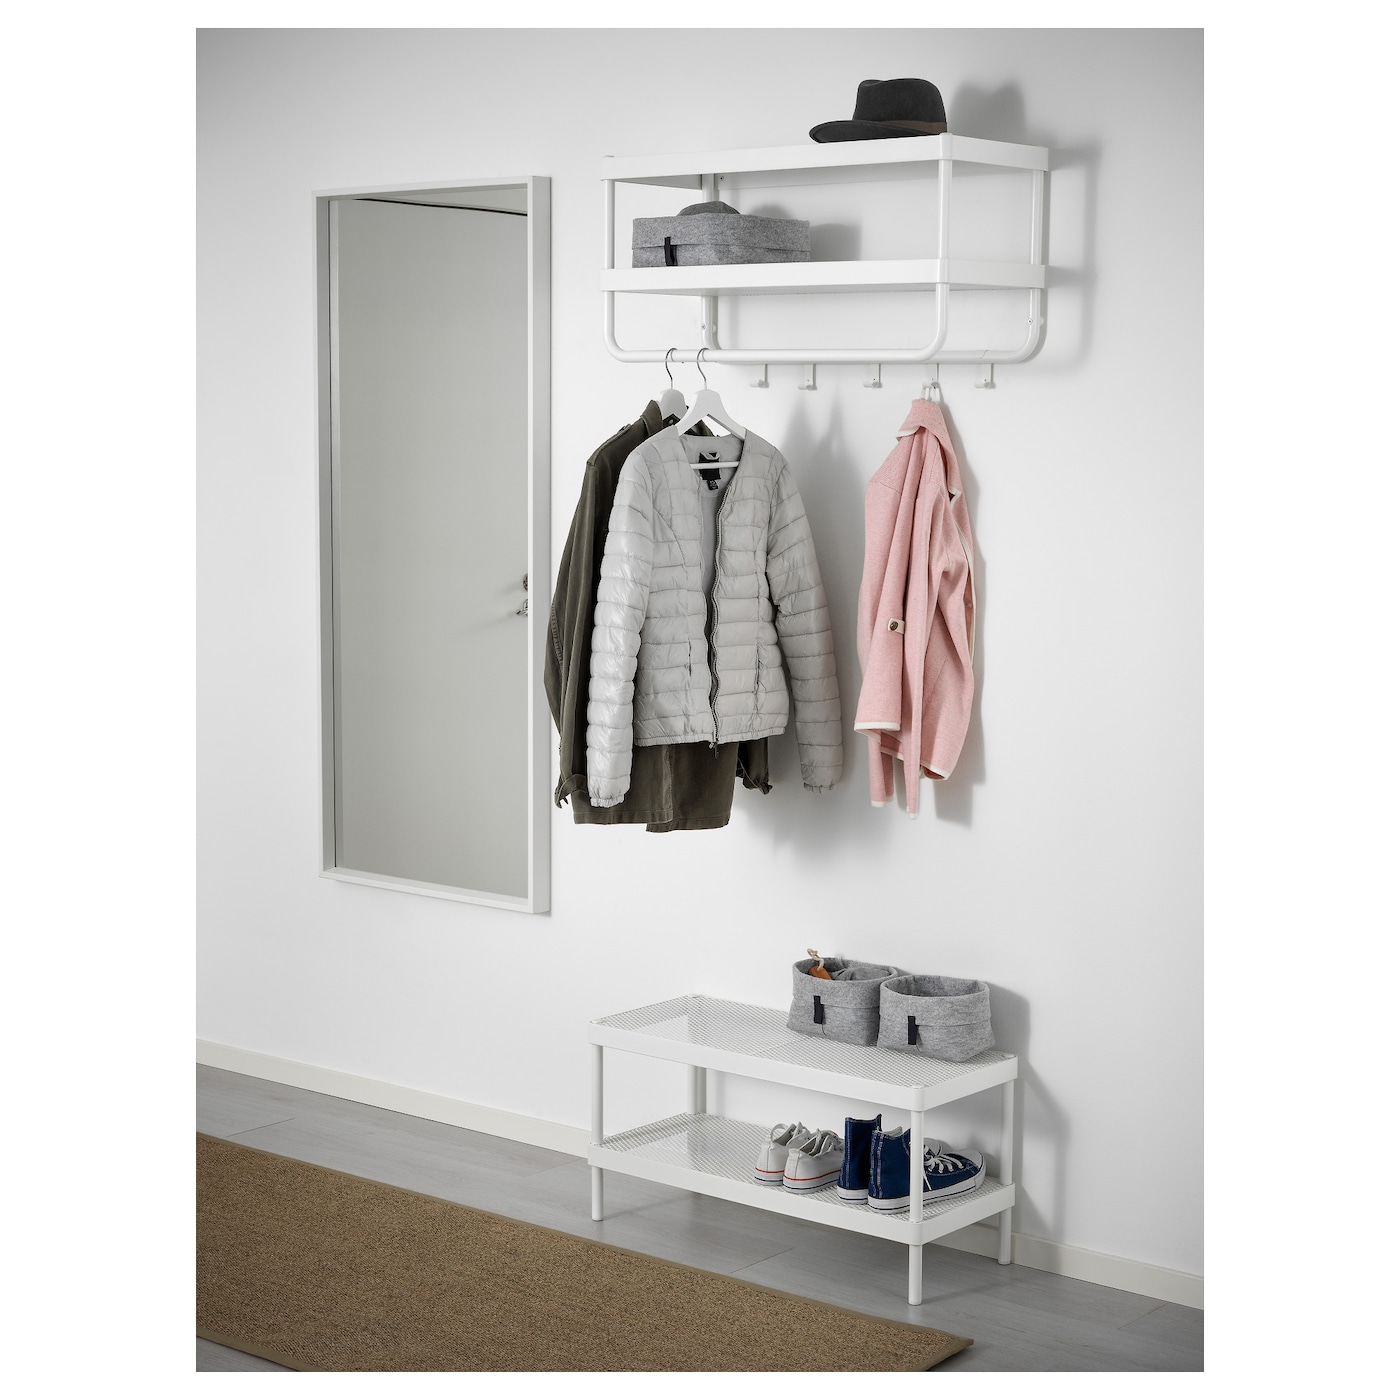 mackap r tag re chaussures 78 cm ikea. Black Bedroom Furniture Sets. Home Design Ideas